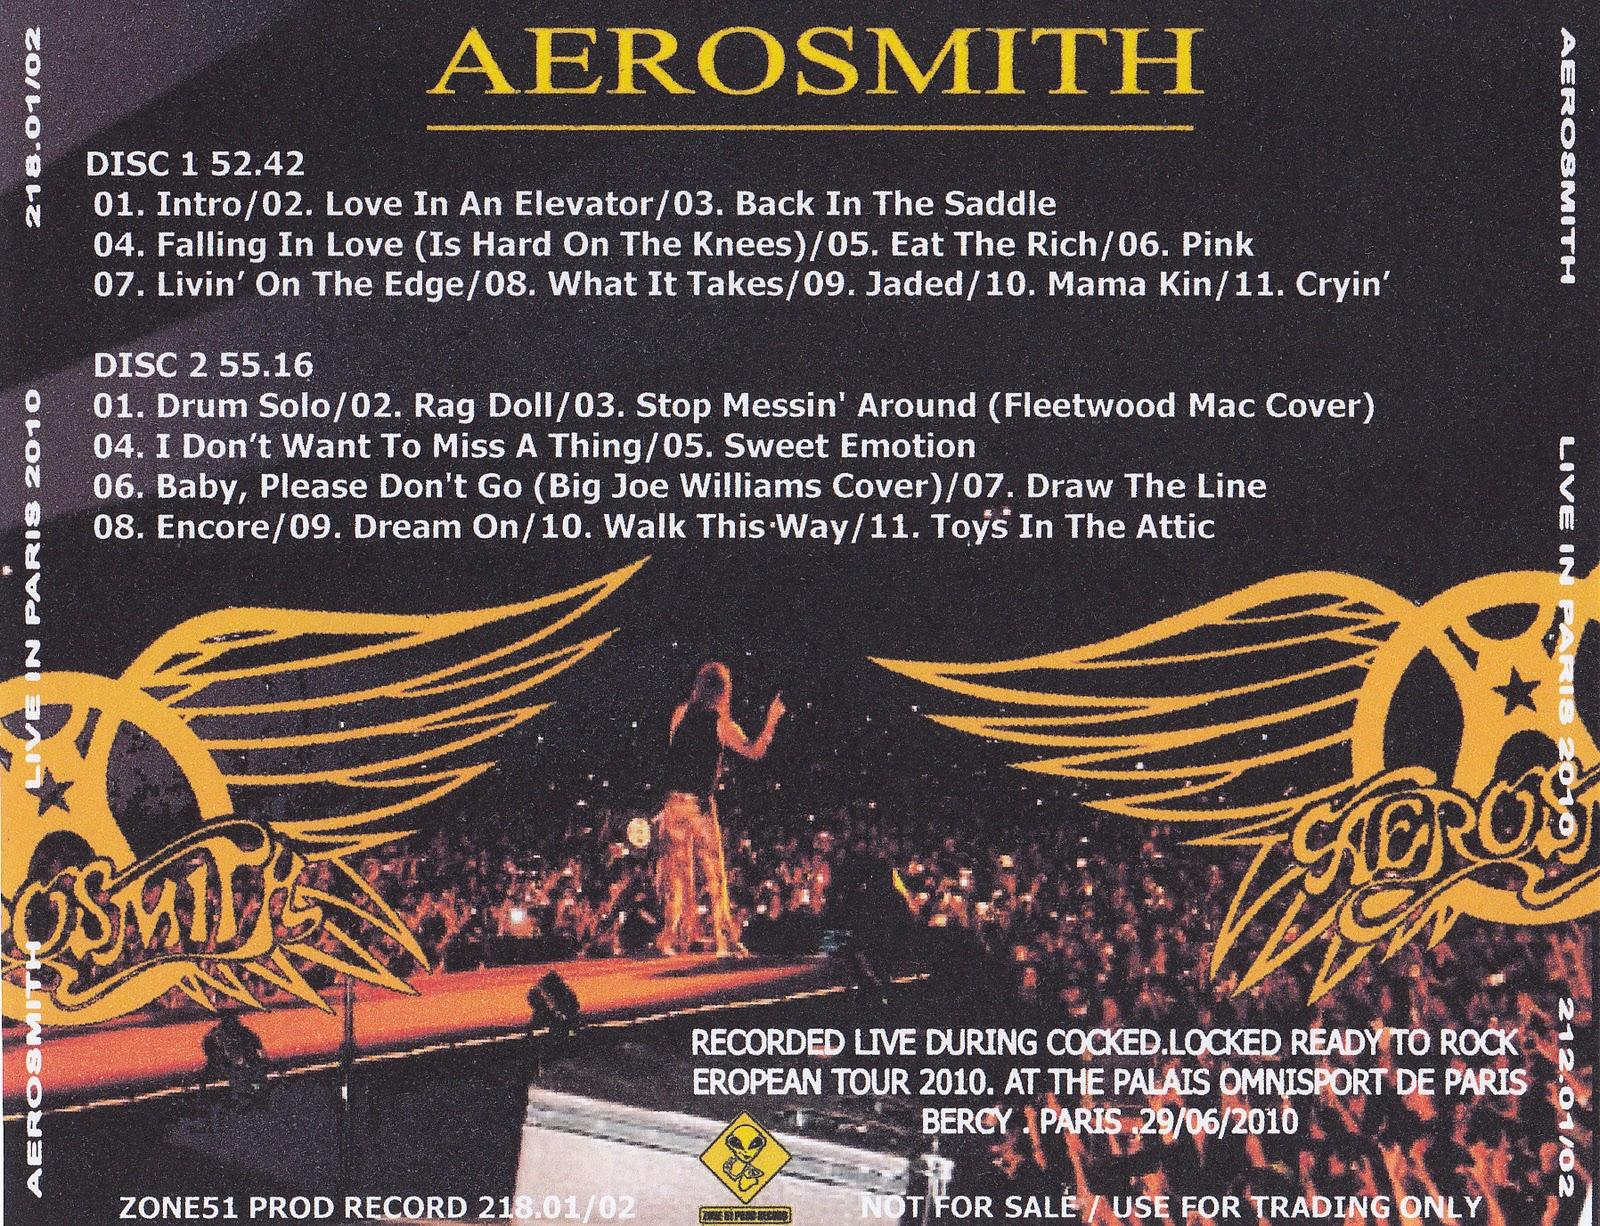 Aerosmith Bootlegs Cover Arts Live In Paris 2010